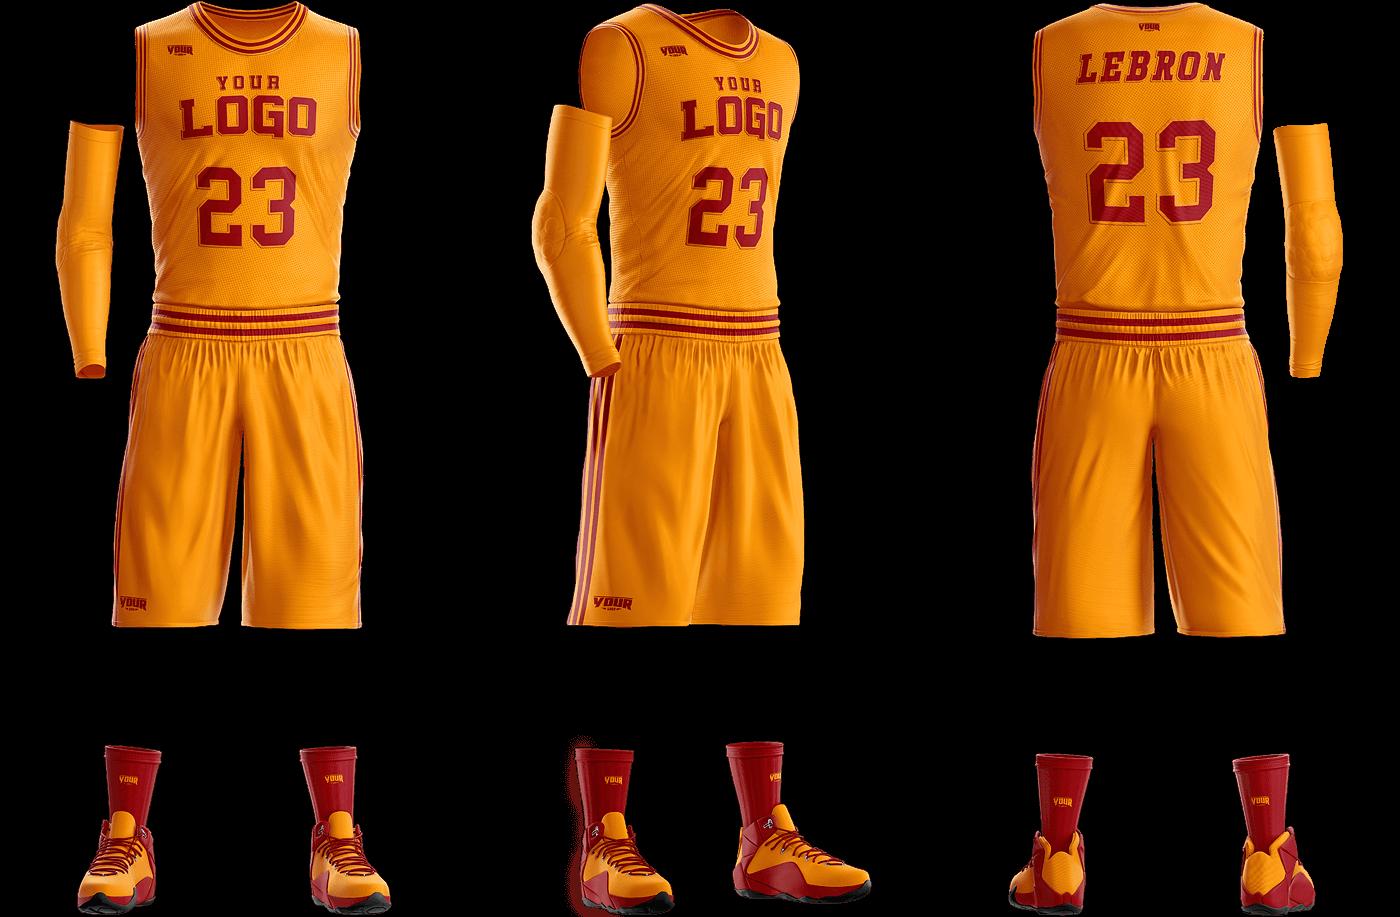 Download Basketball Uniform Photoshop Template Mockup Basketball Uniforms Design Basketball Uniforms Xavier Basketball